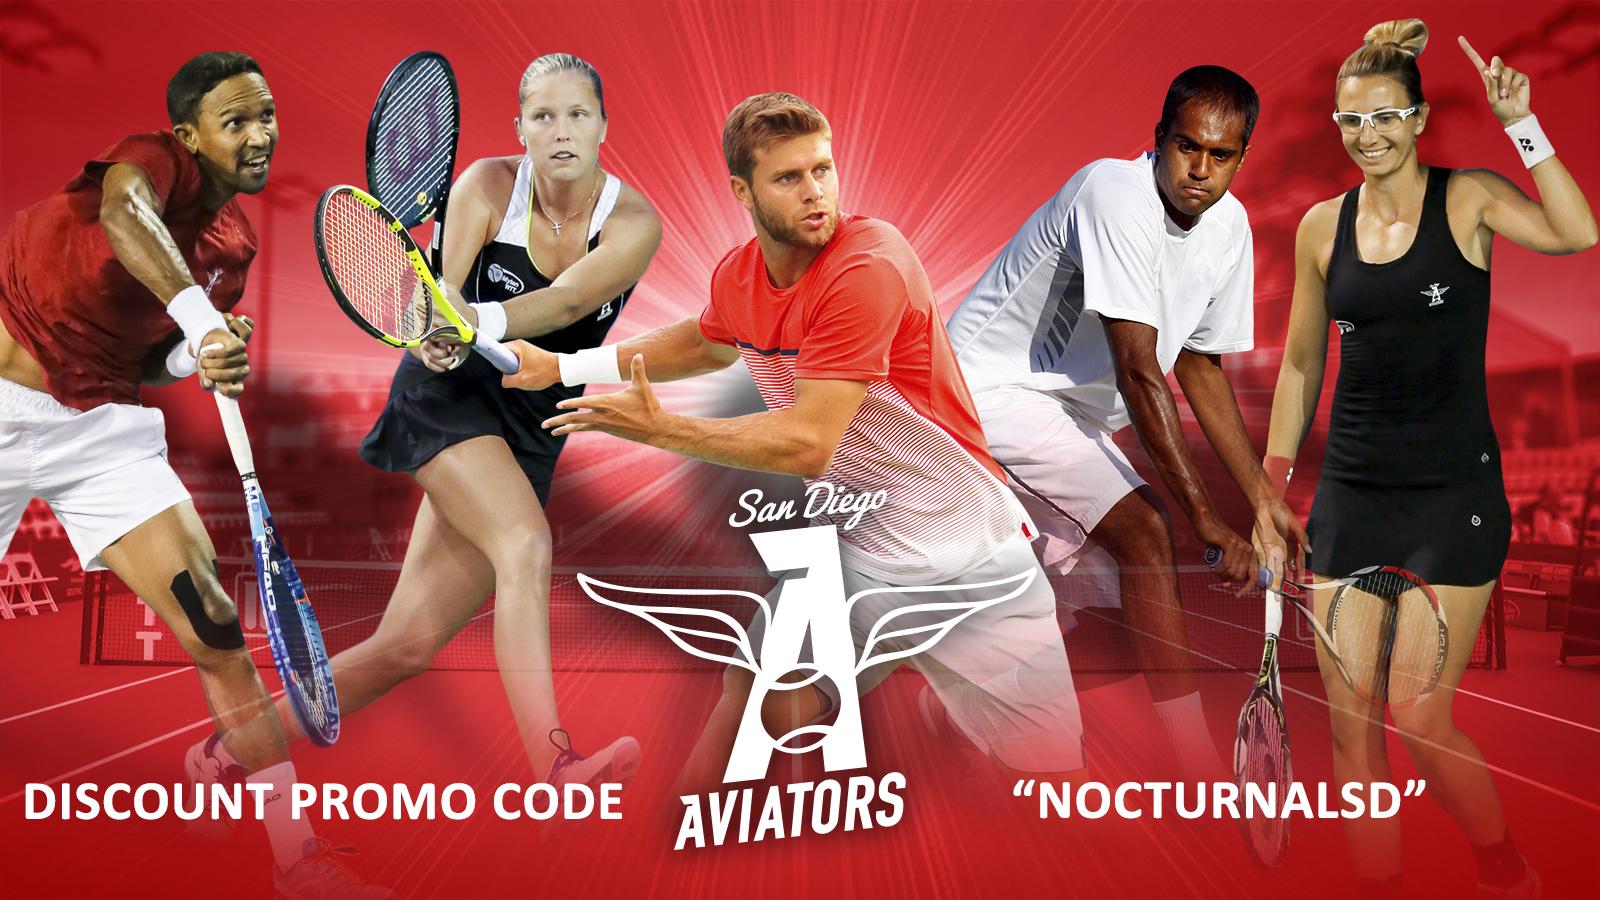 San Diego Aviators Tennis Tickets Discount Promo Code, Discounted VIP Passes, Season Tickets, Omni La Costa Resort & Spa, Carlsbad, Summer